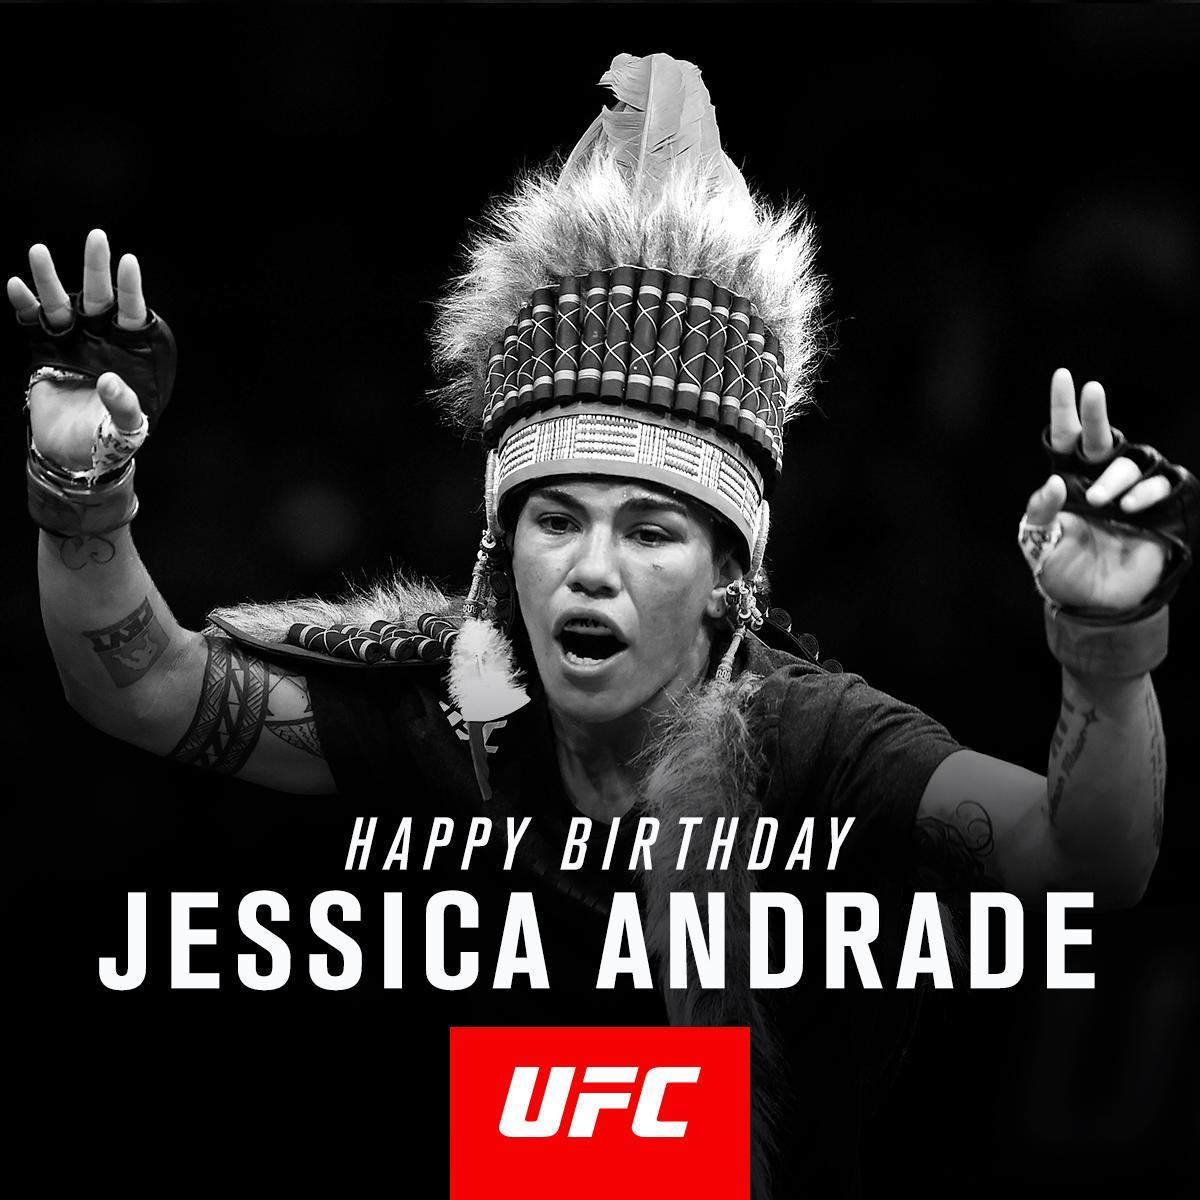 Wishing a very Happy Birthday to @JessicaMMAPro!�� https://t.co/N33ALW8FVs